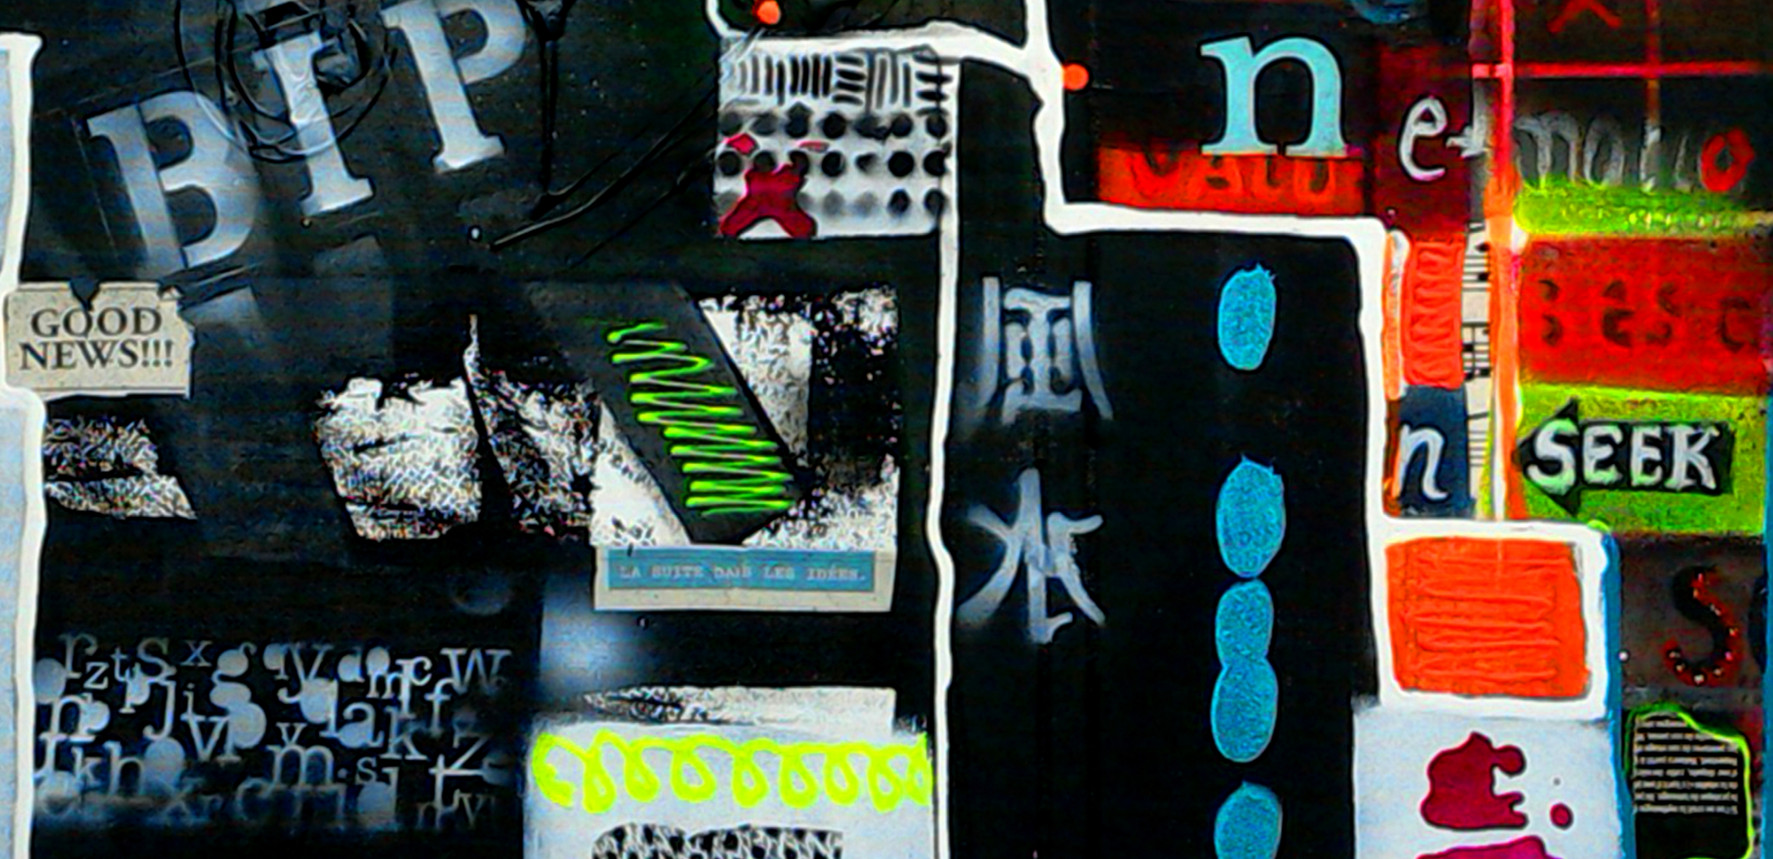 Patch Words Graffiti